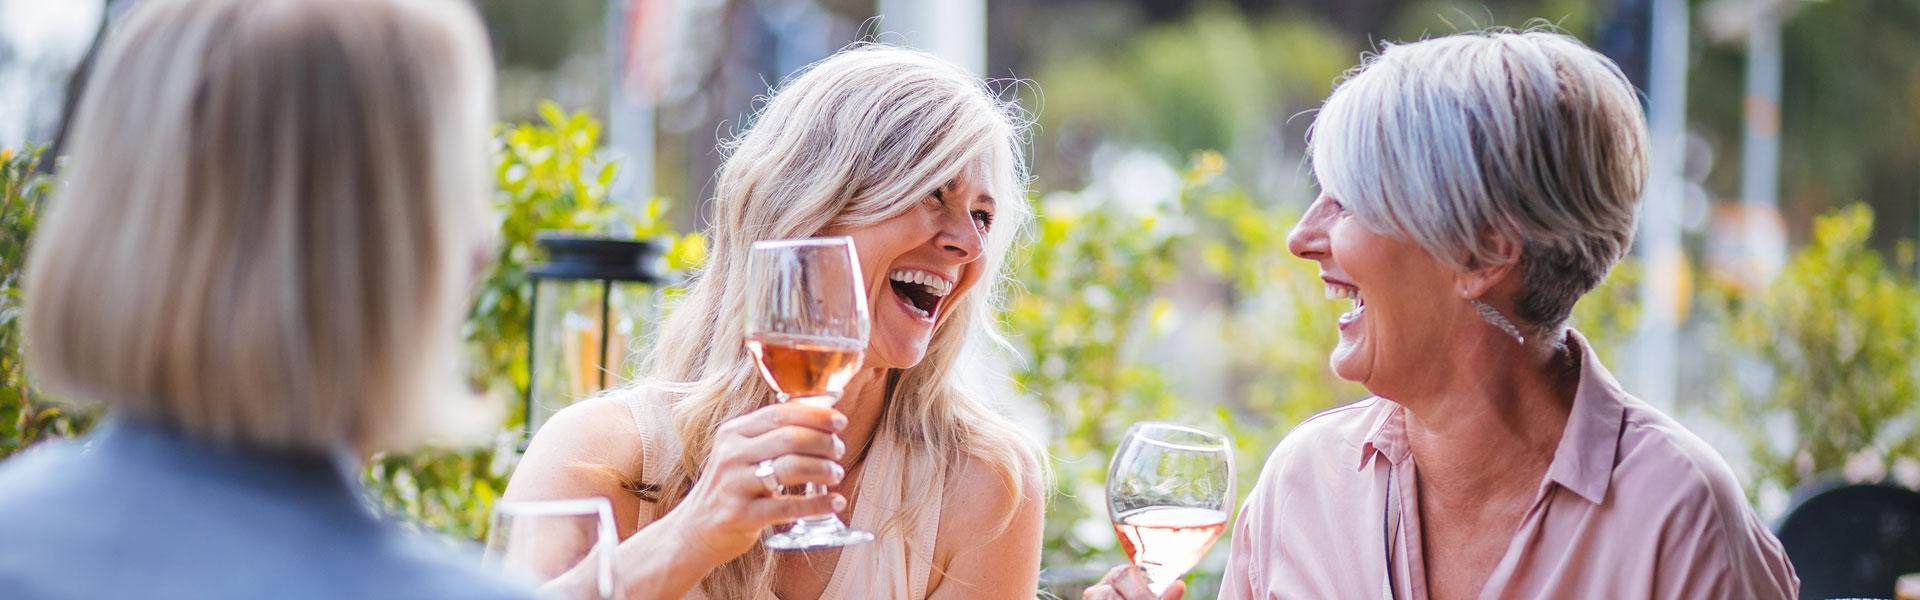 Three older women sitting outside drinking glasses of wine